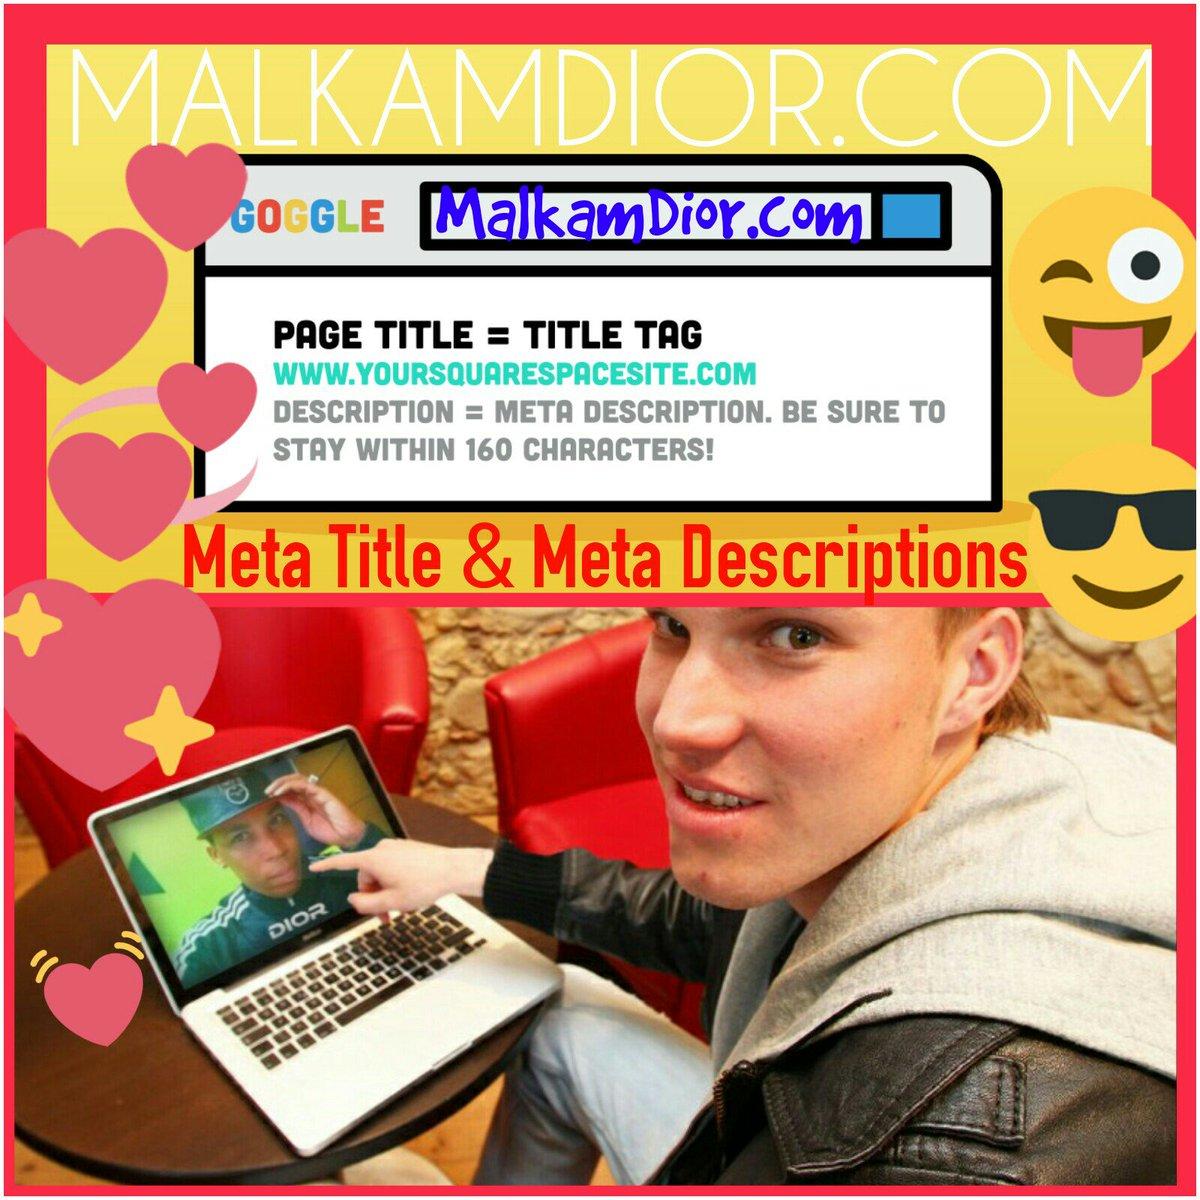 Top Trends in Meta Title and Meta Description this Season -  http://www. MalkamDior.com  &nbsp;     #HOWTO #tipsandtricks #SEOTalk #MetaDescription#MetaTitle #seo #Networkmarketing #PrimeDay  #MondayMotivation #marketing #ContentChat #GoogleEDU #SMM<br>http://pic.twitter.com/SbO9OoUFkc &ndash; à Google Creative Lab